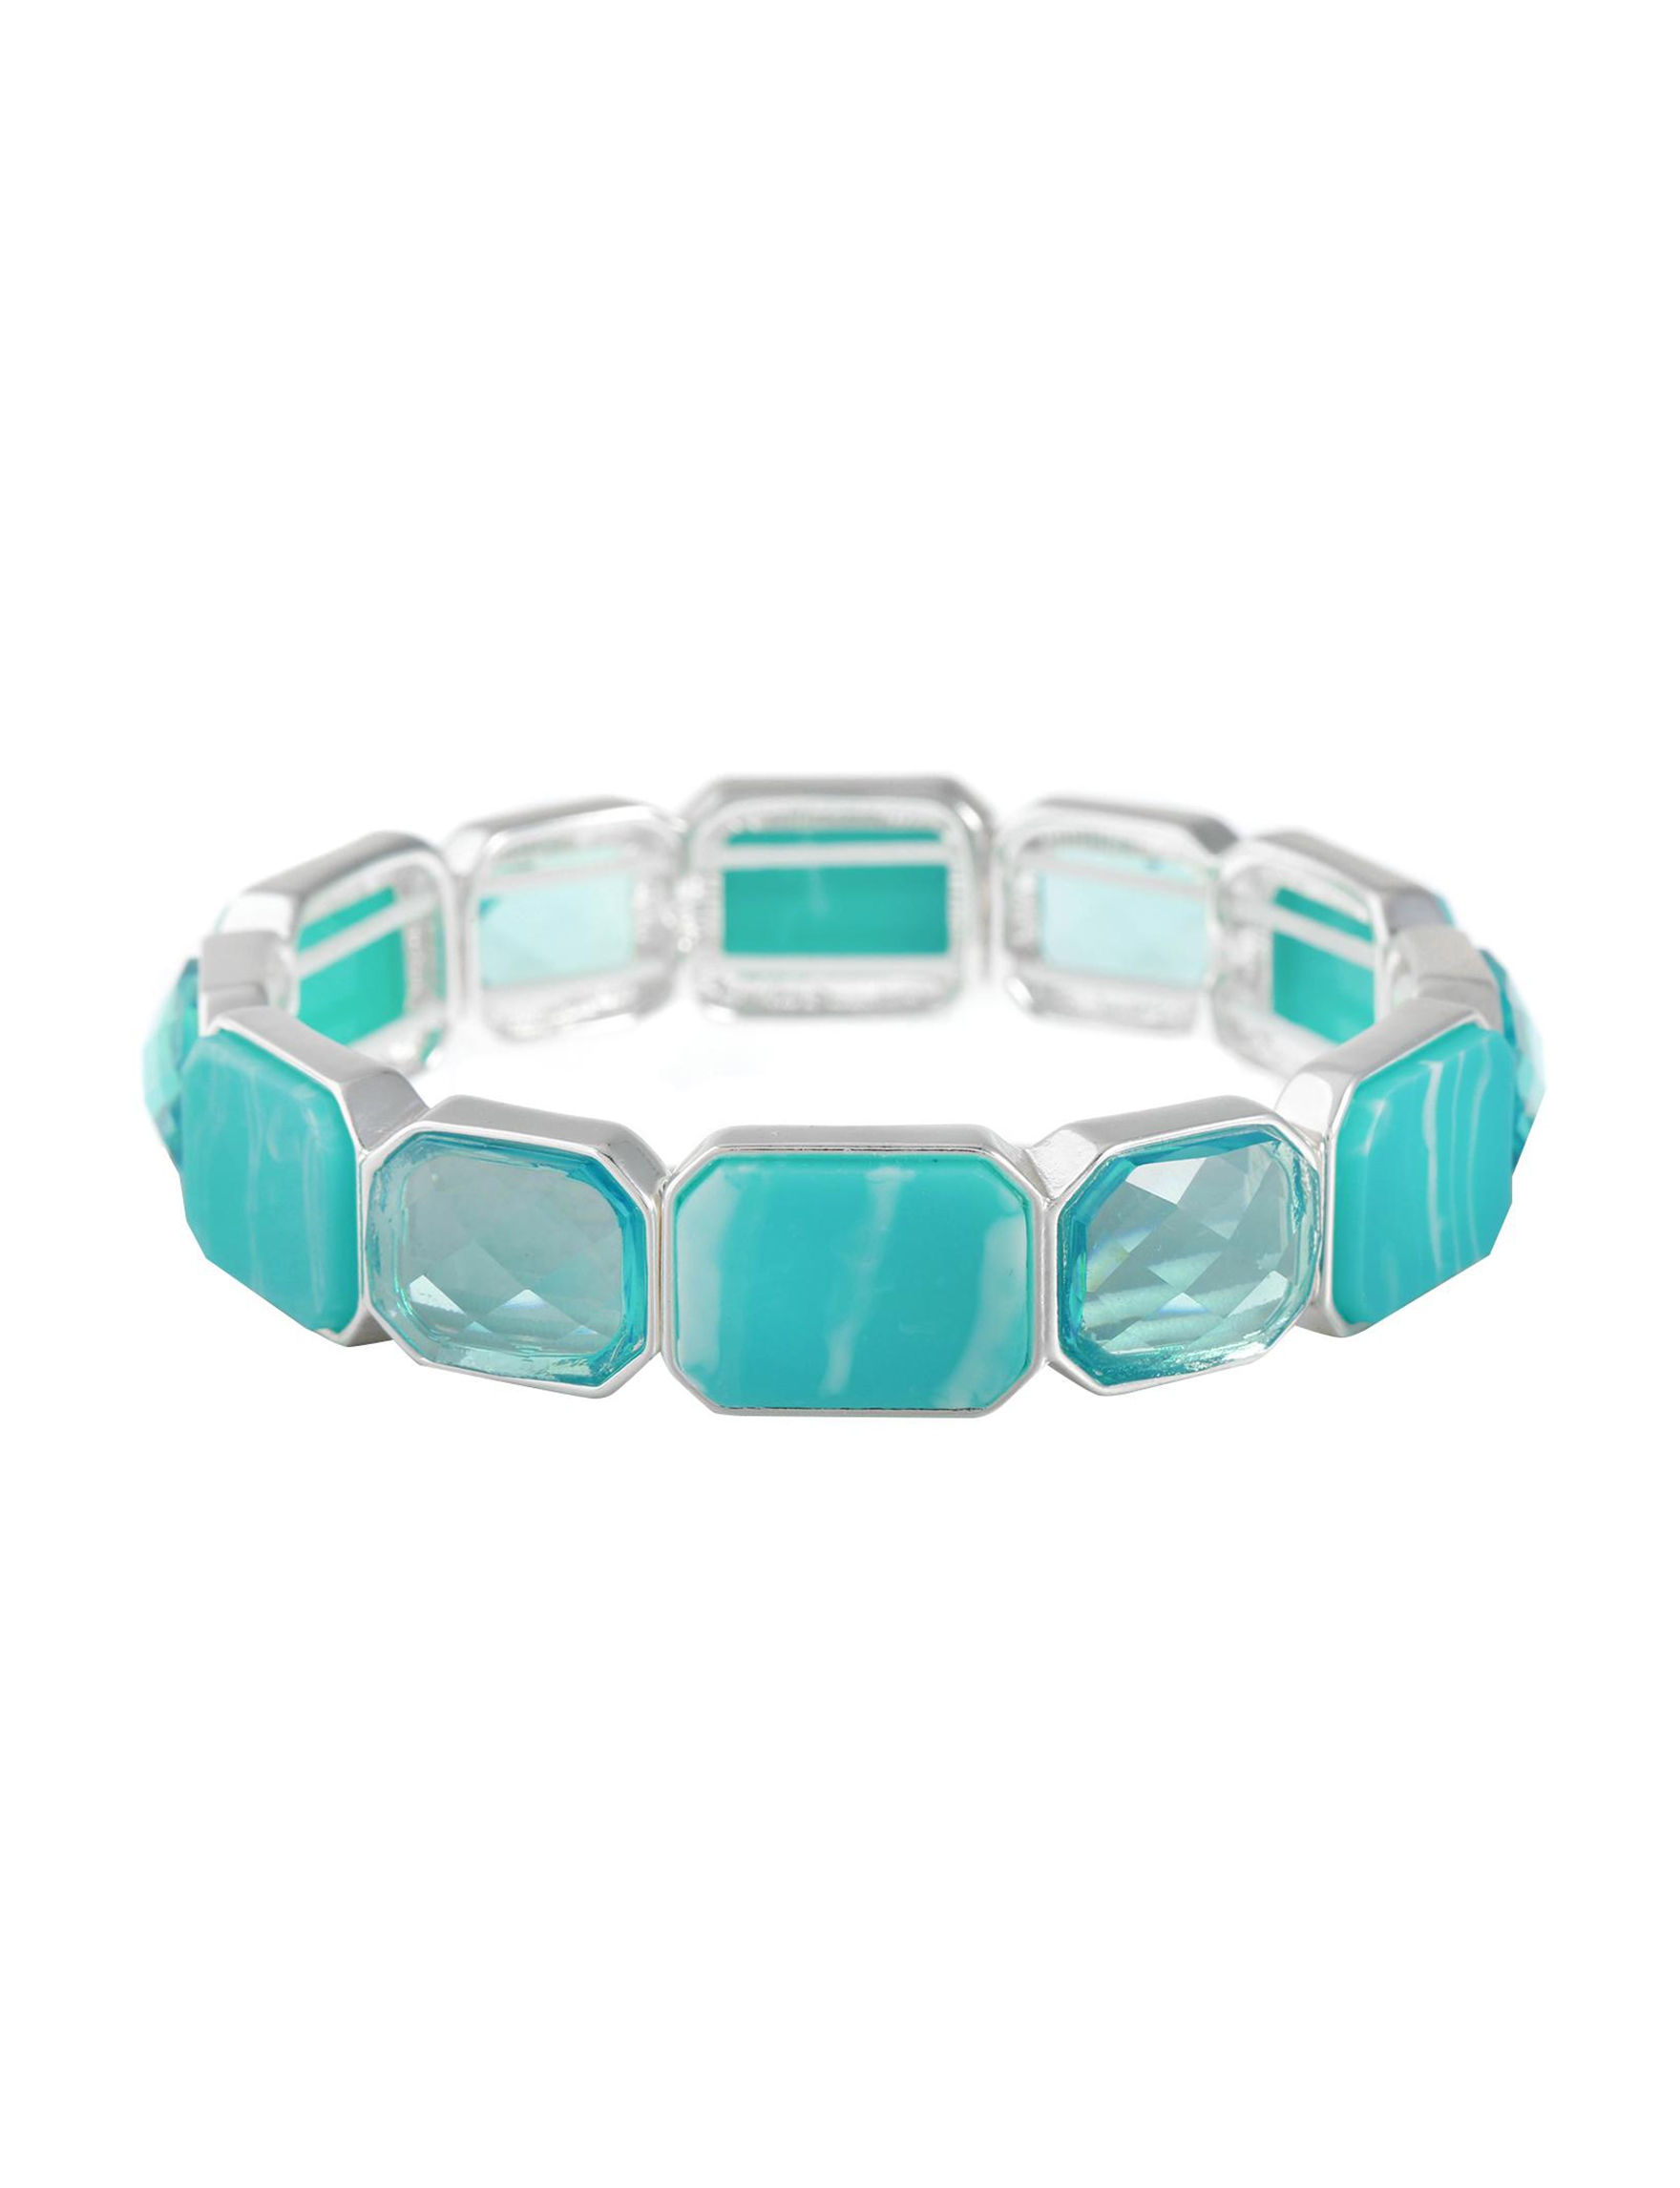 Gloria Vanderbilt Teal / Multi Bracelets Fashion Jewelry